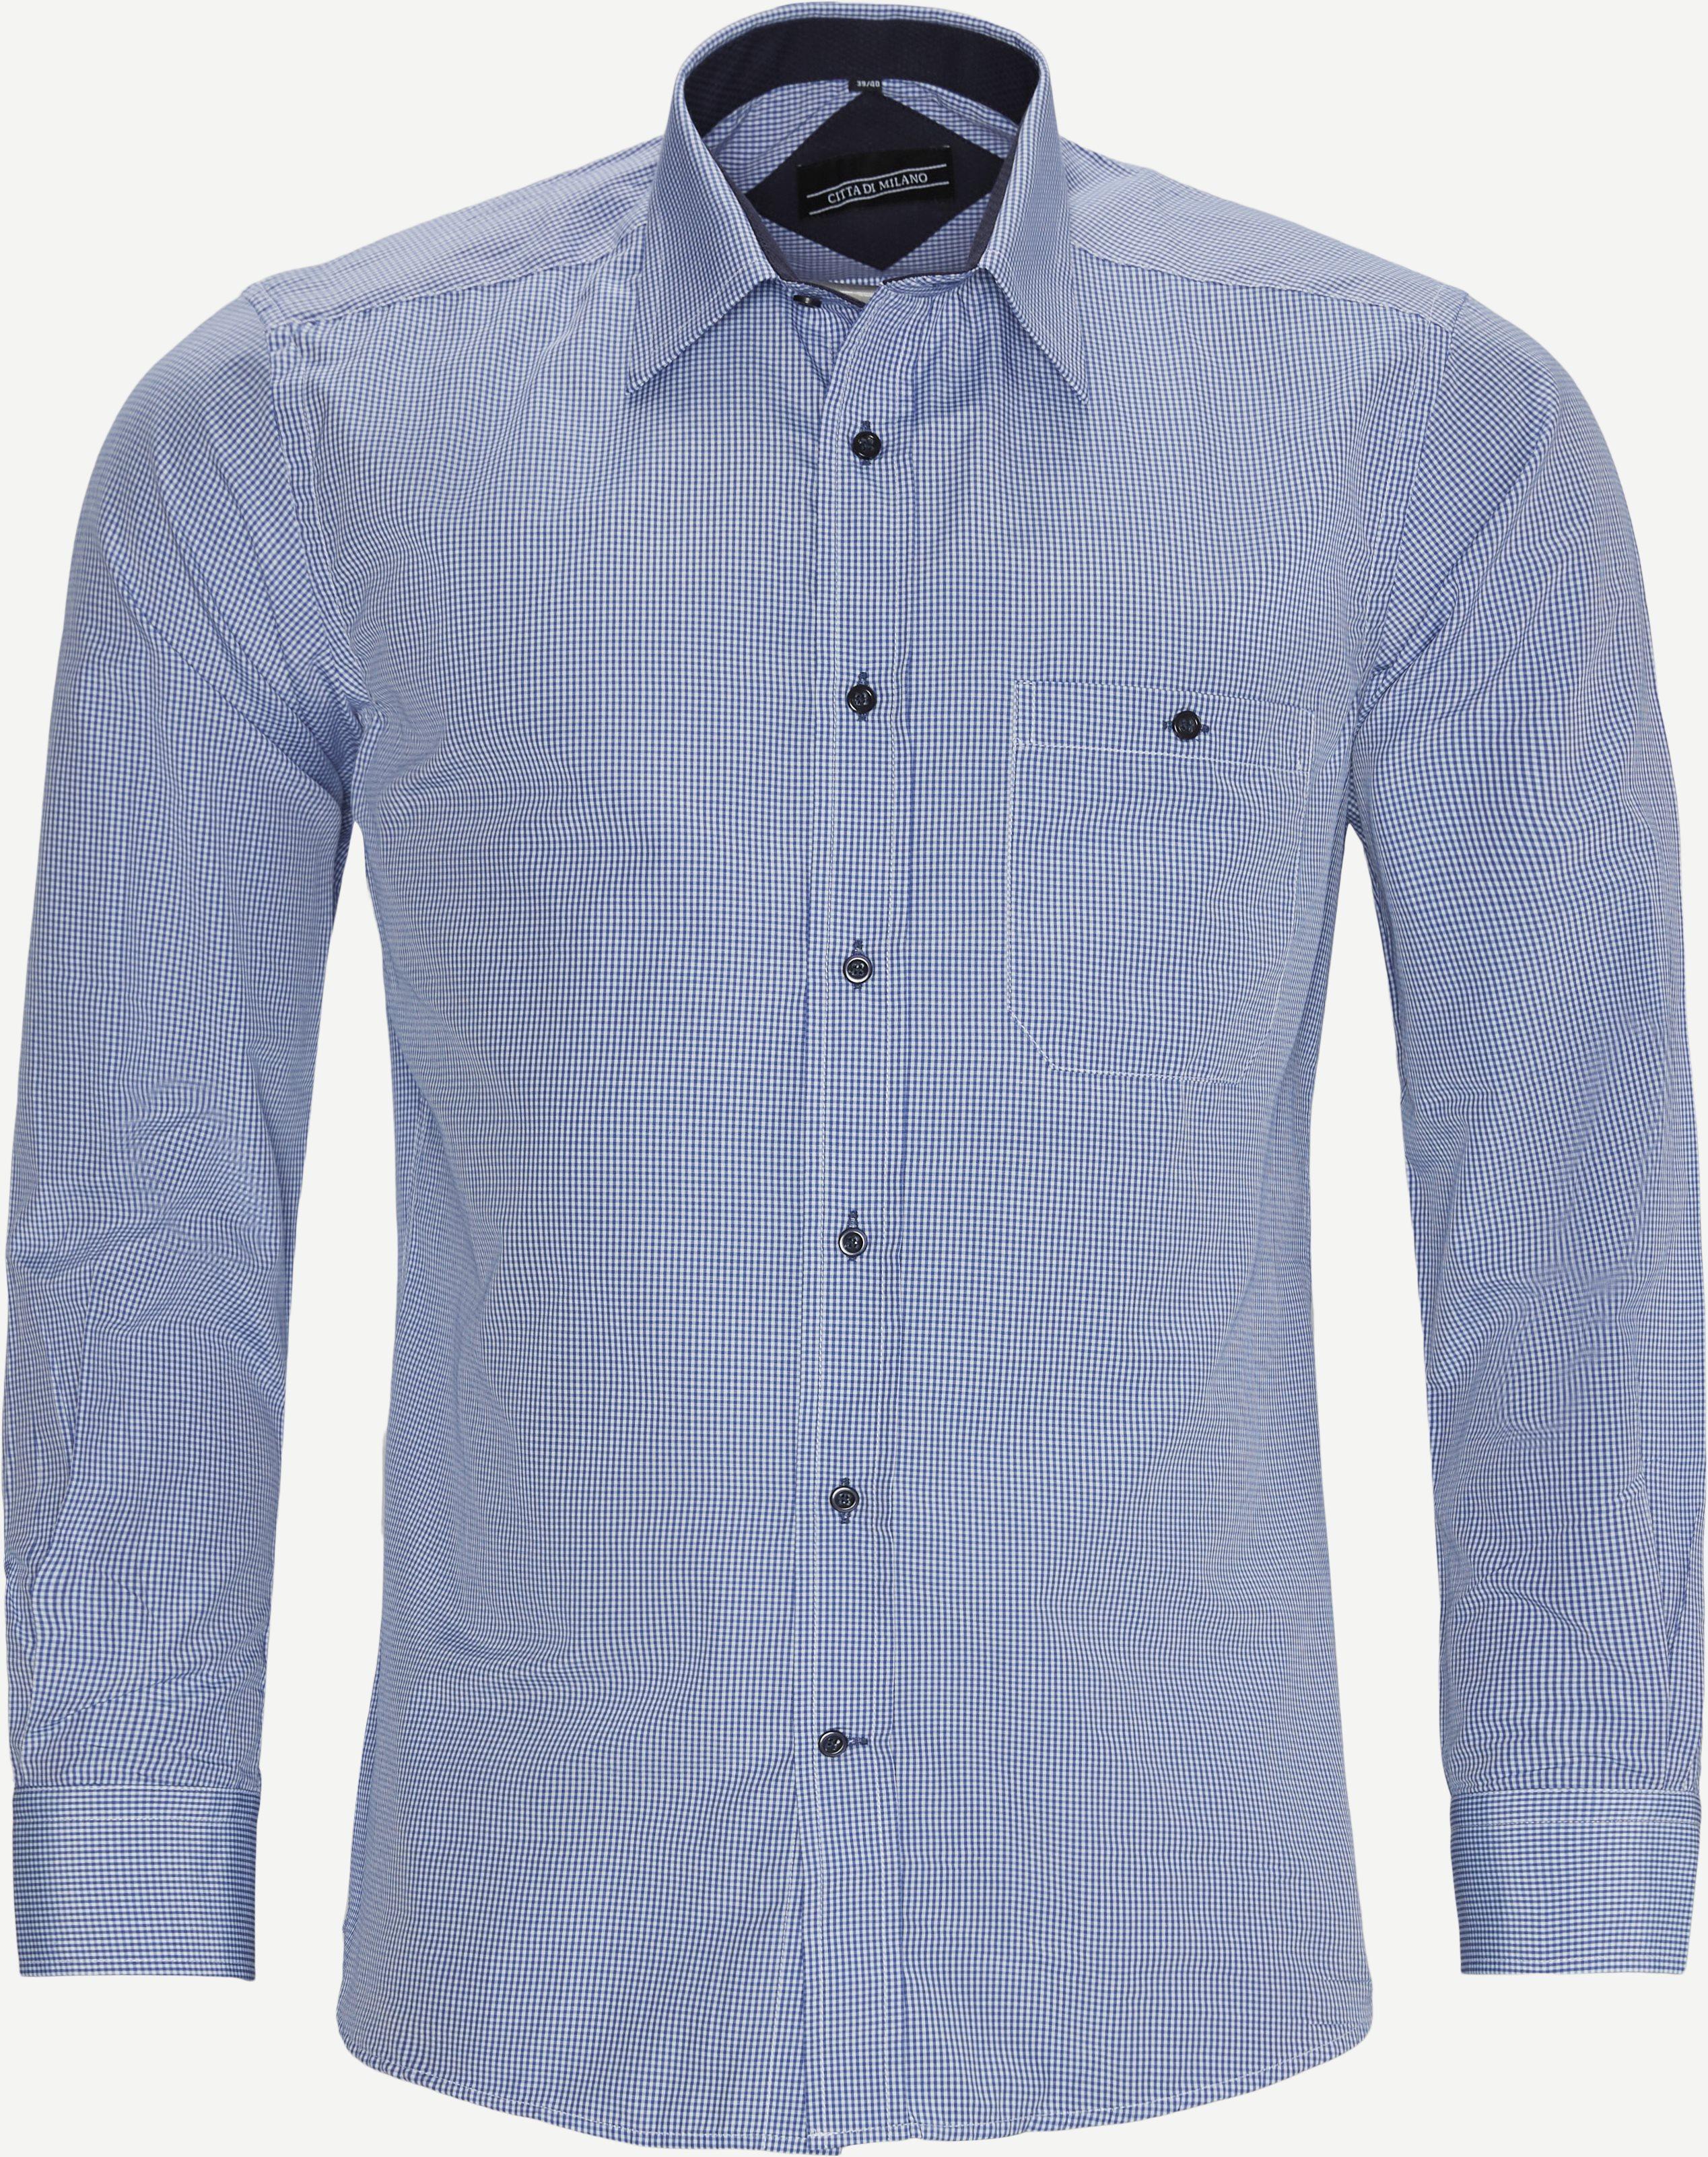 Hemden - Regular - Blau